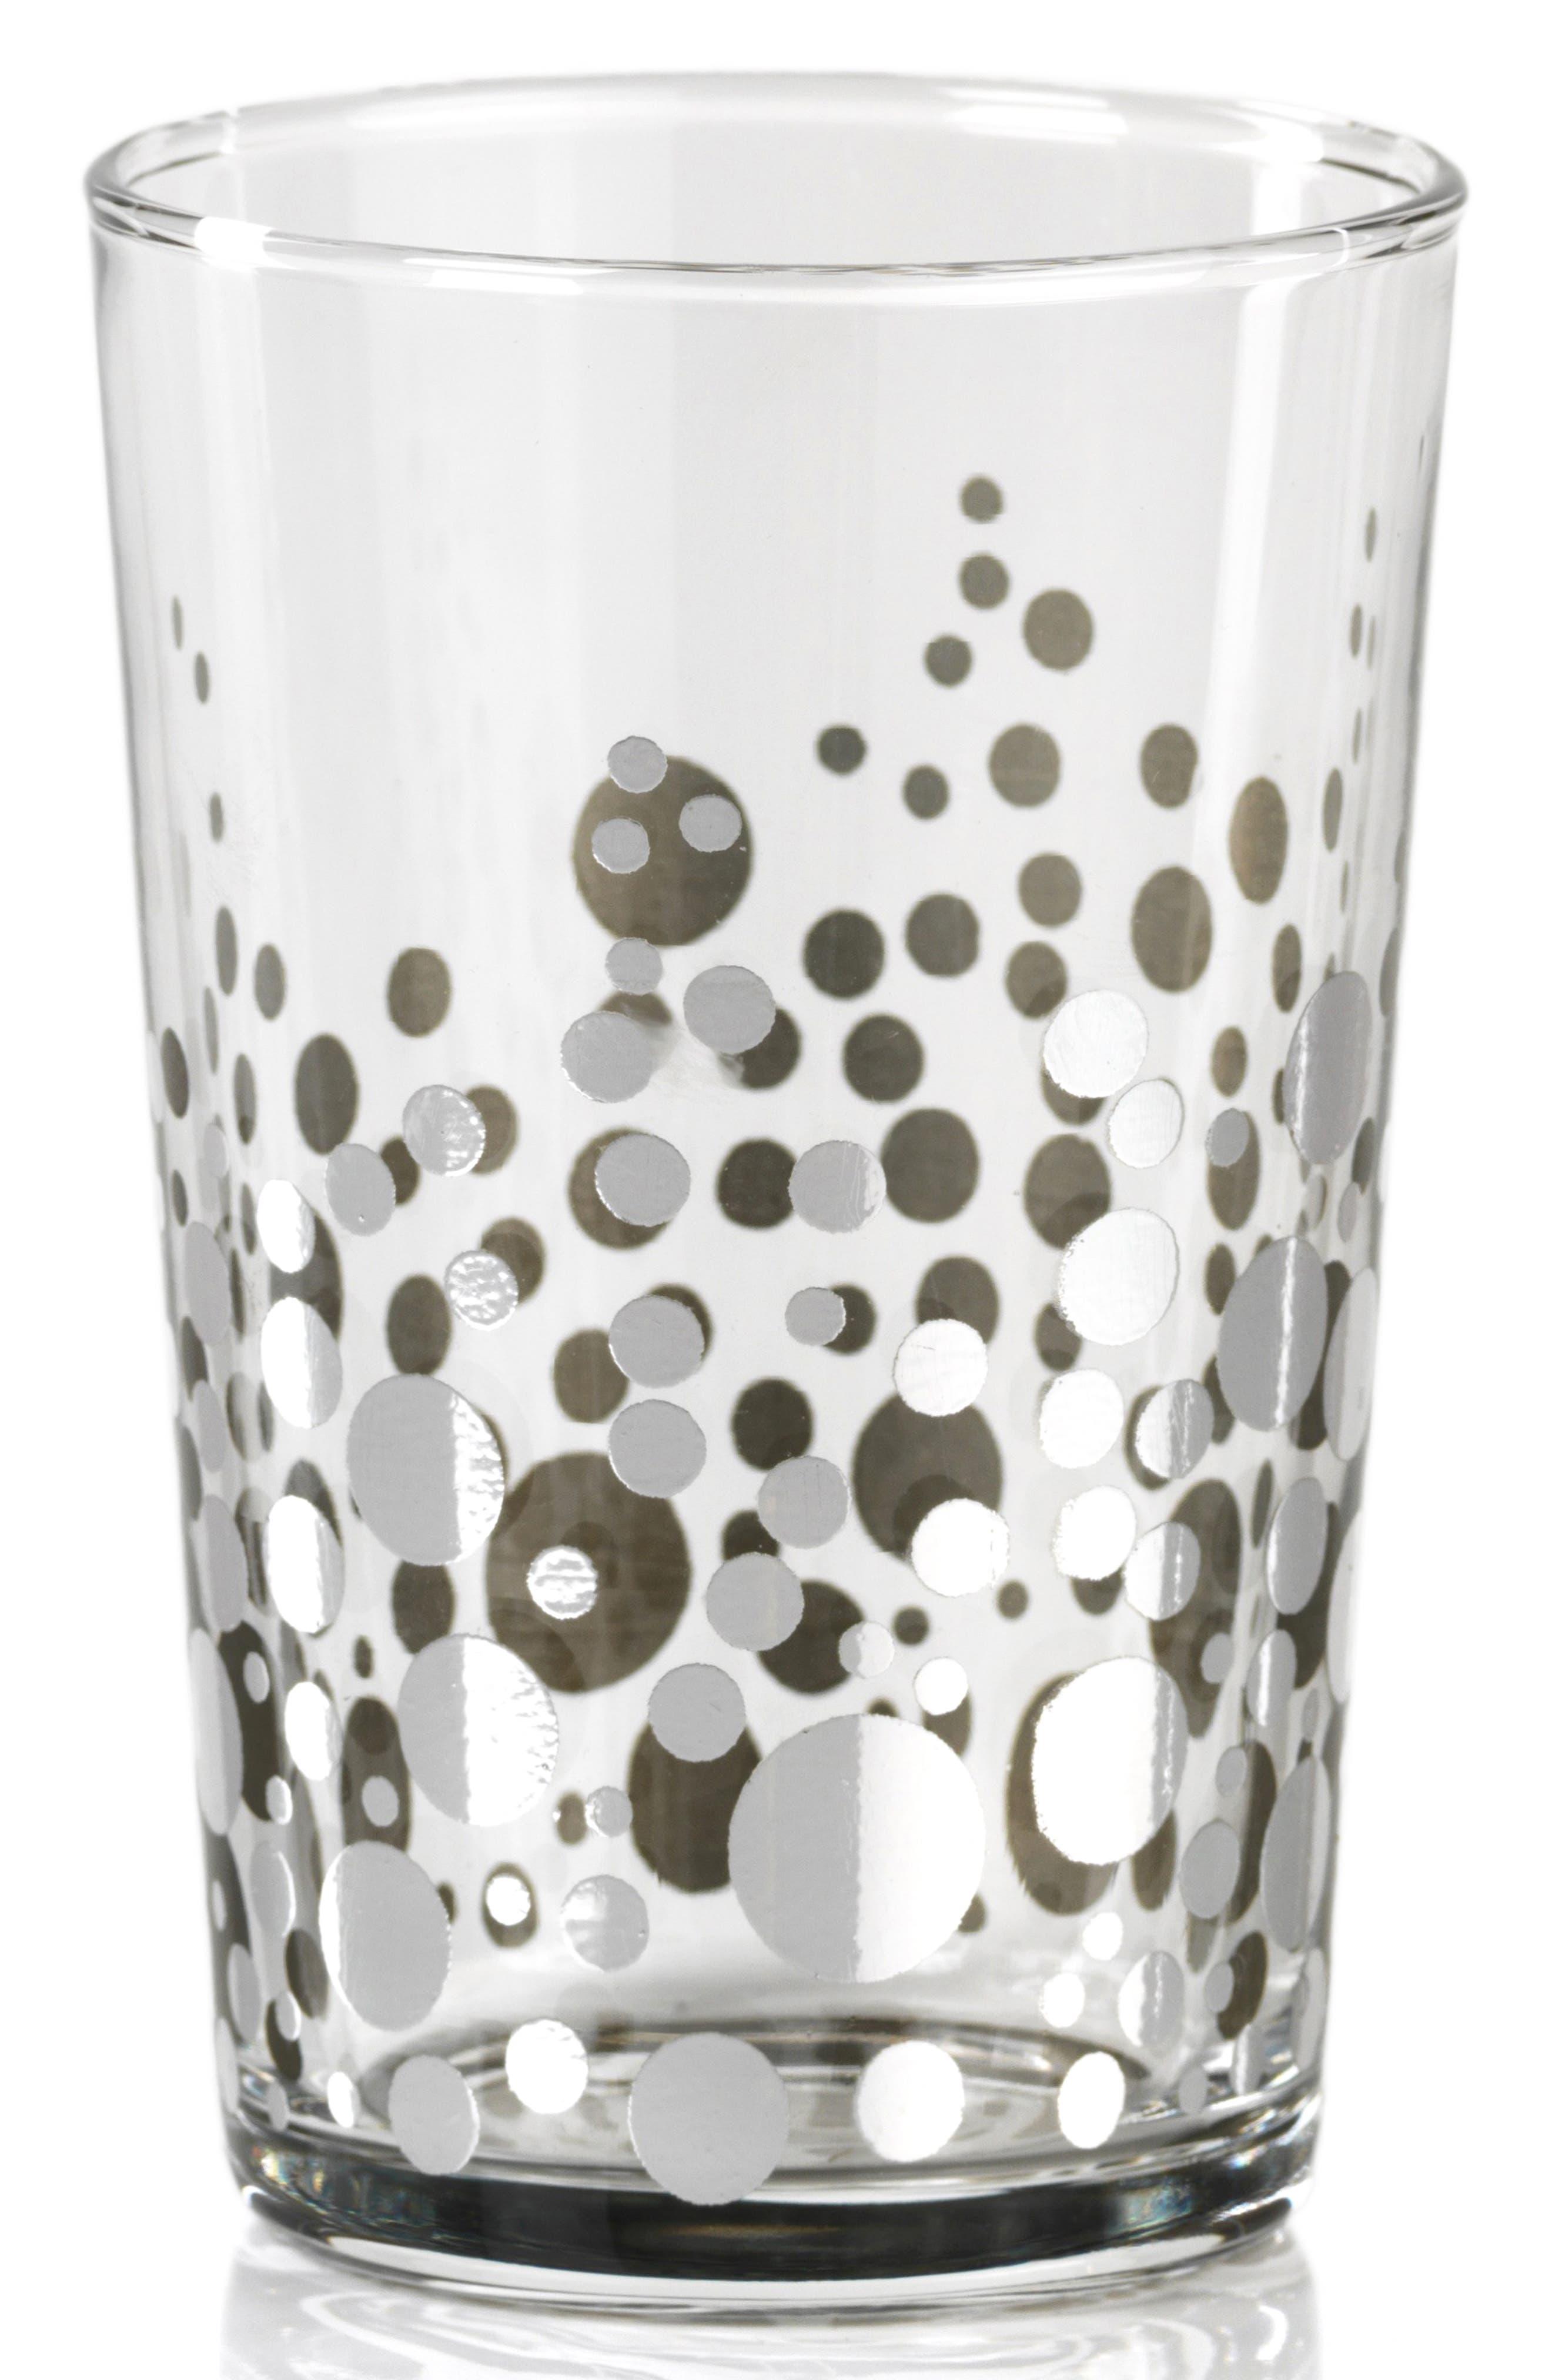 Set of 6 Dot Design Glass Tealight Candleholders,                             Main thumbnail 1, color,                             SILVER